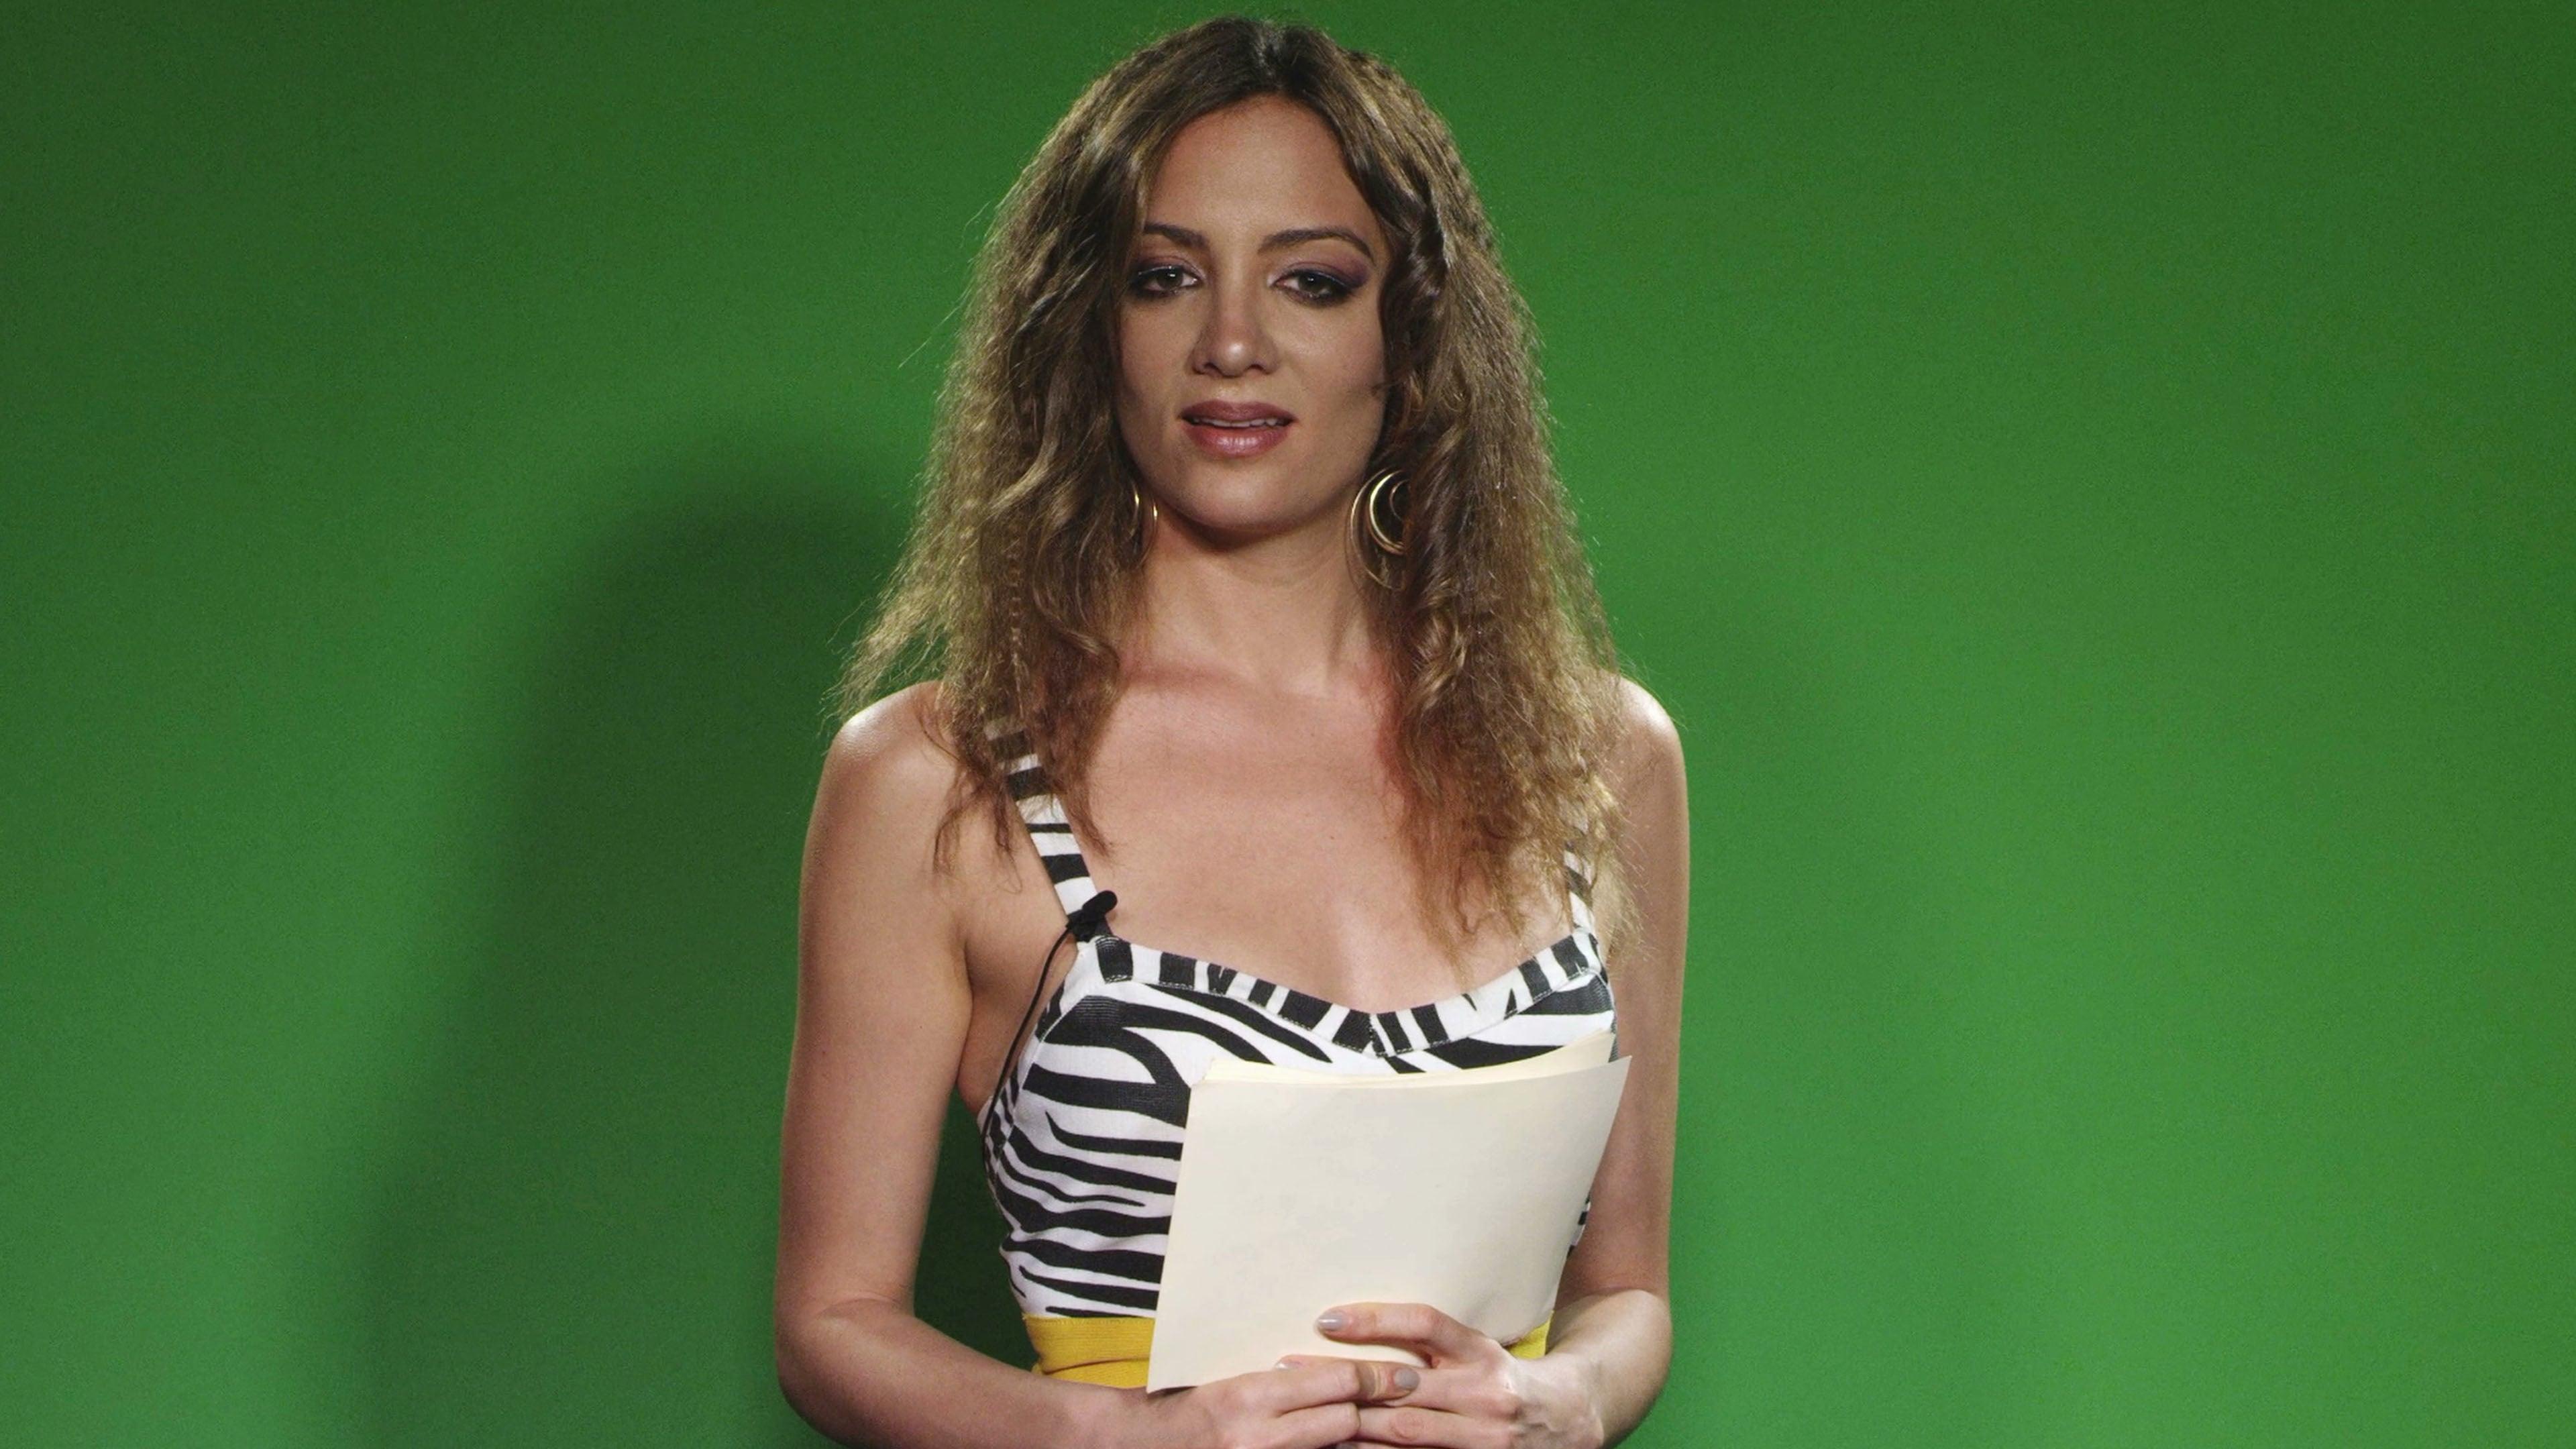 2018 popular aroa rodriguez nude from la peste season 1 episode 1 tv series hd sex scene including her full frontal nudity on pppstv - 1 1